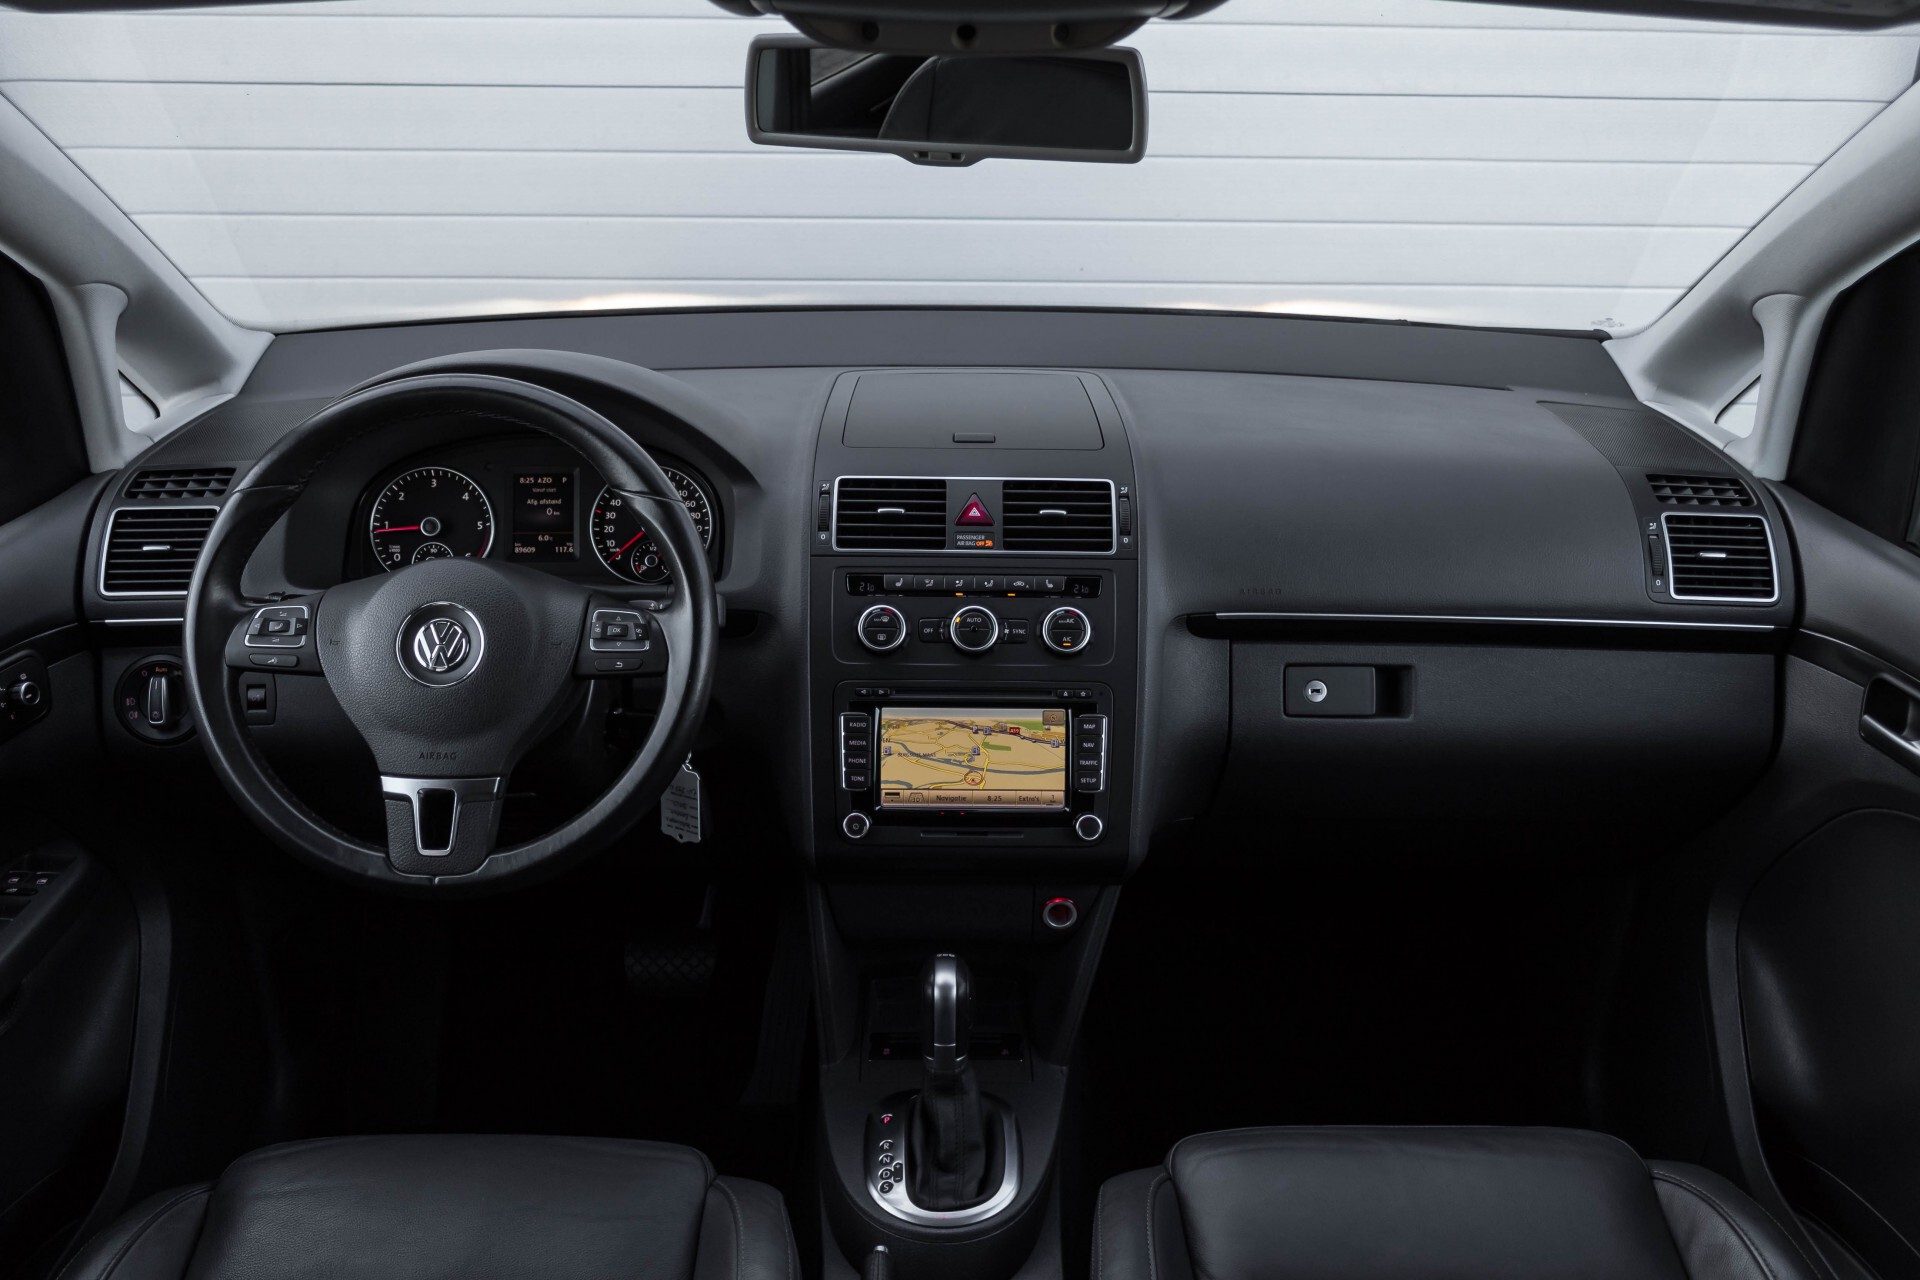 Volkswagen Touran 2.0 TDI Highline 7Persoons 177pk Panorama/Leder/Navi/Camera/Verw-Stln/Trhk/ECC/Xenon Aut Foto 9